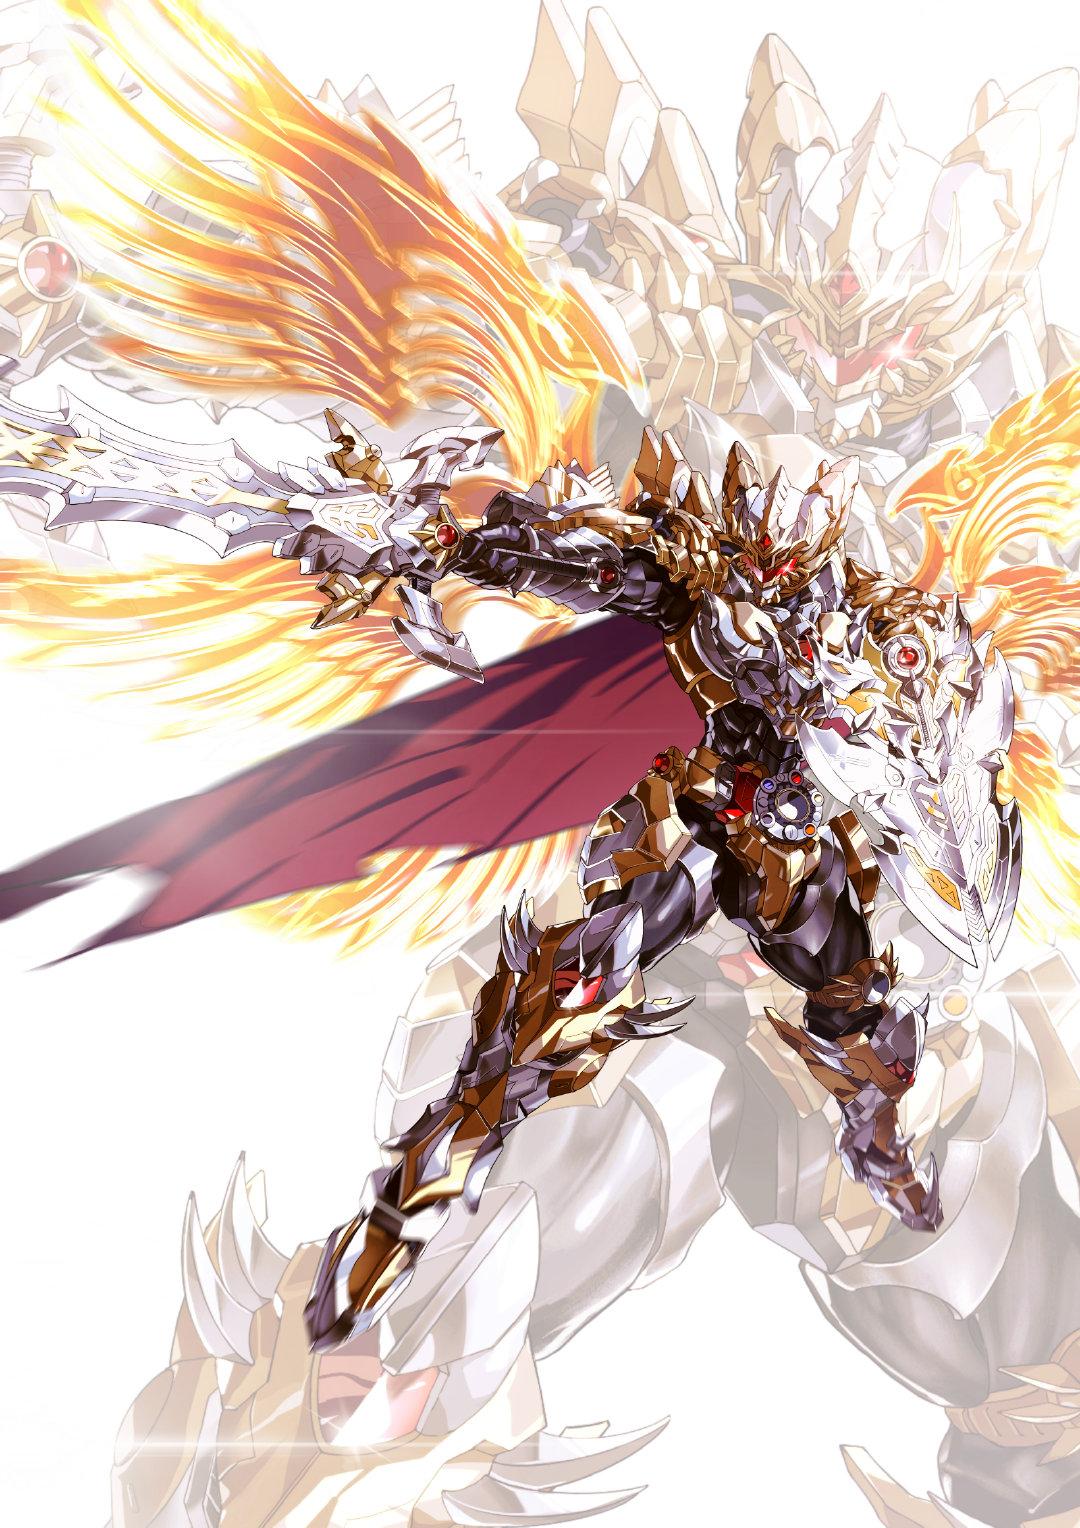 S535_Armor_hero_Emperor_023.jpg